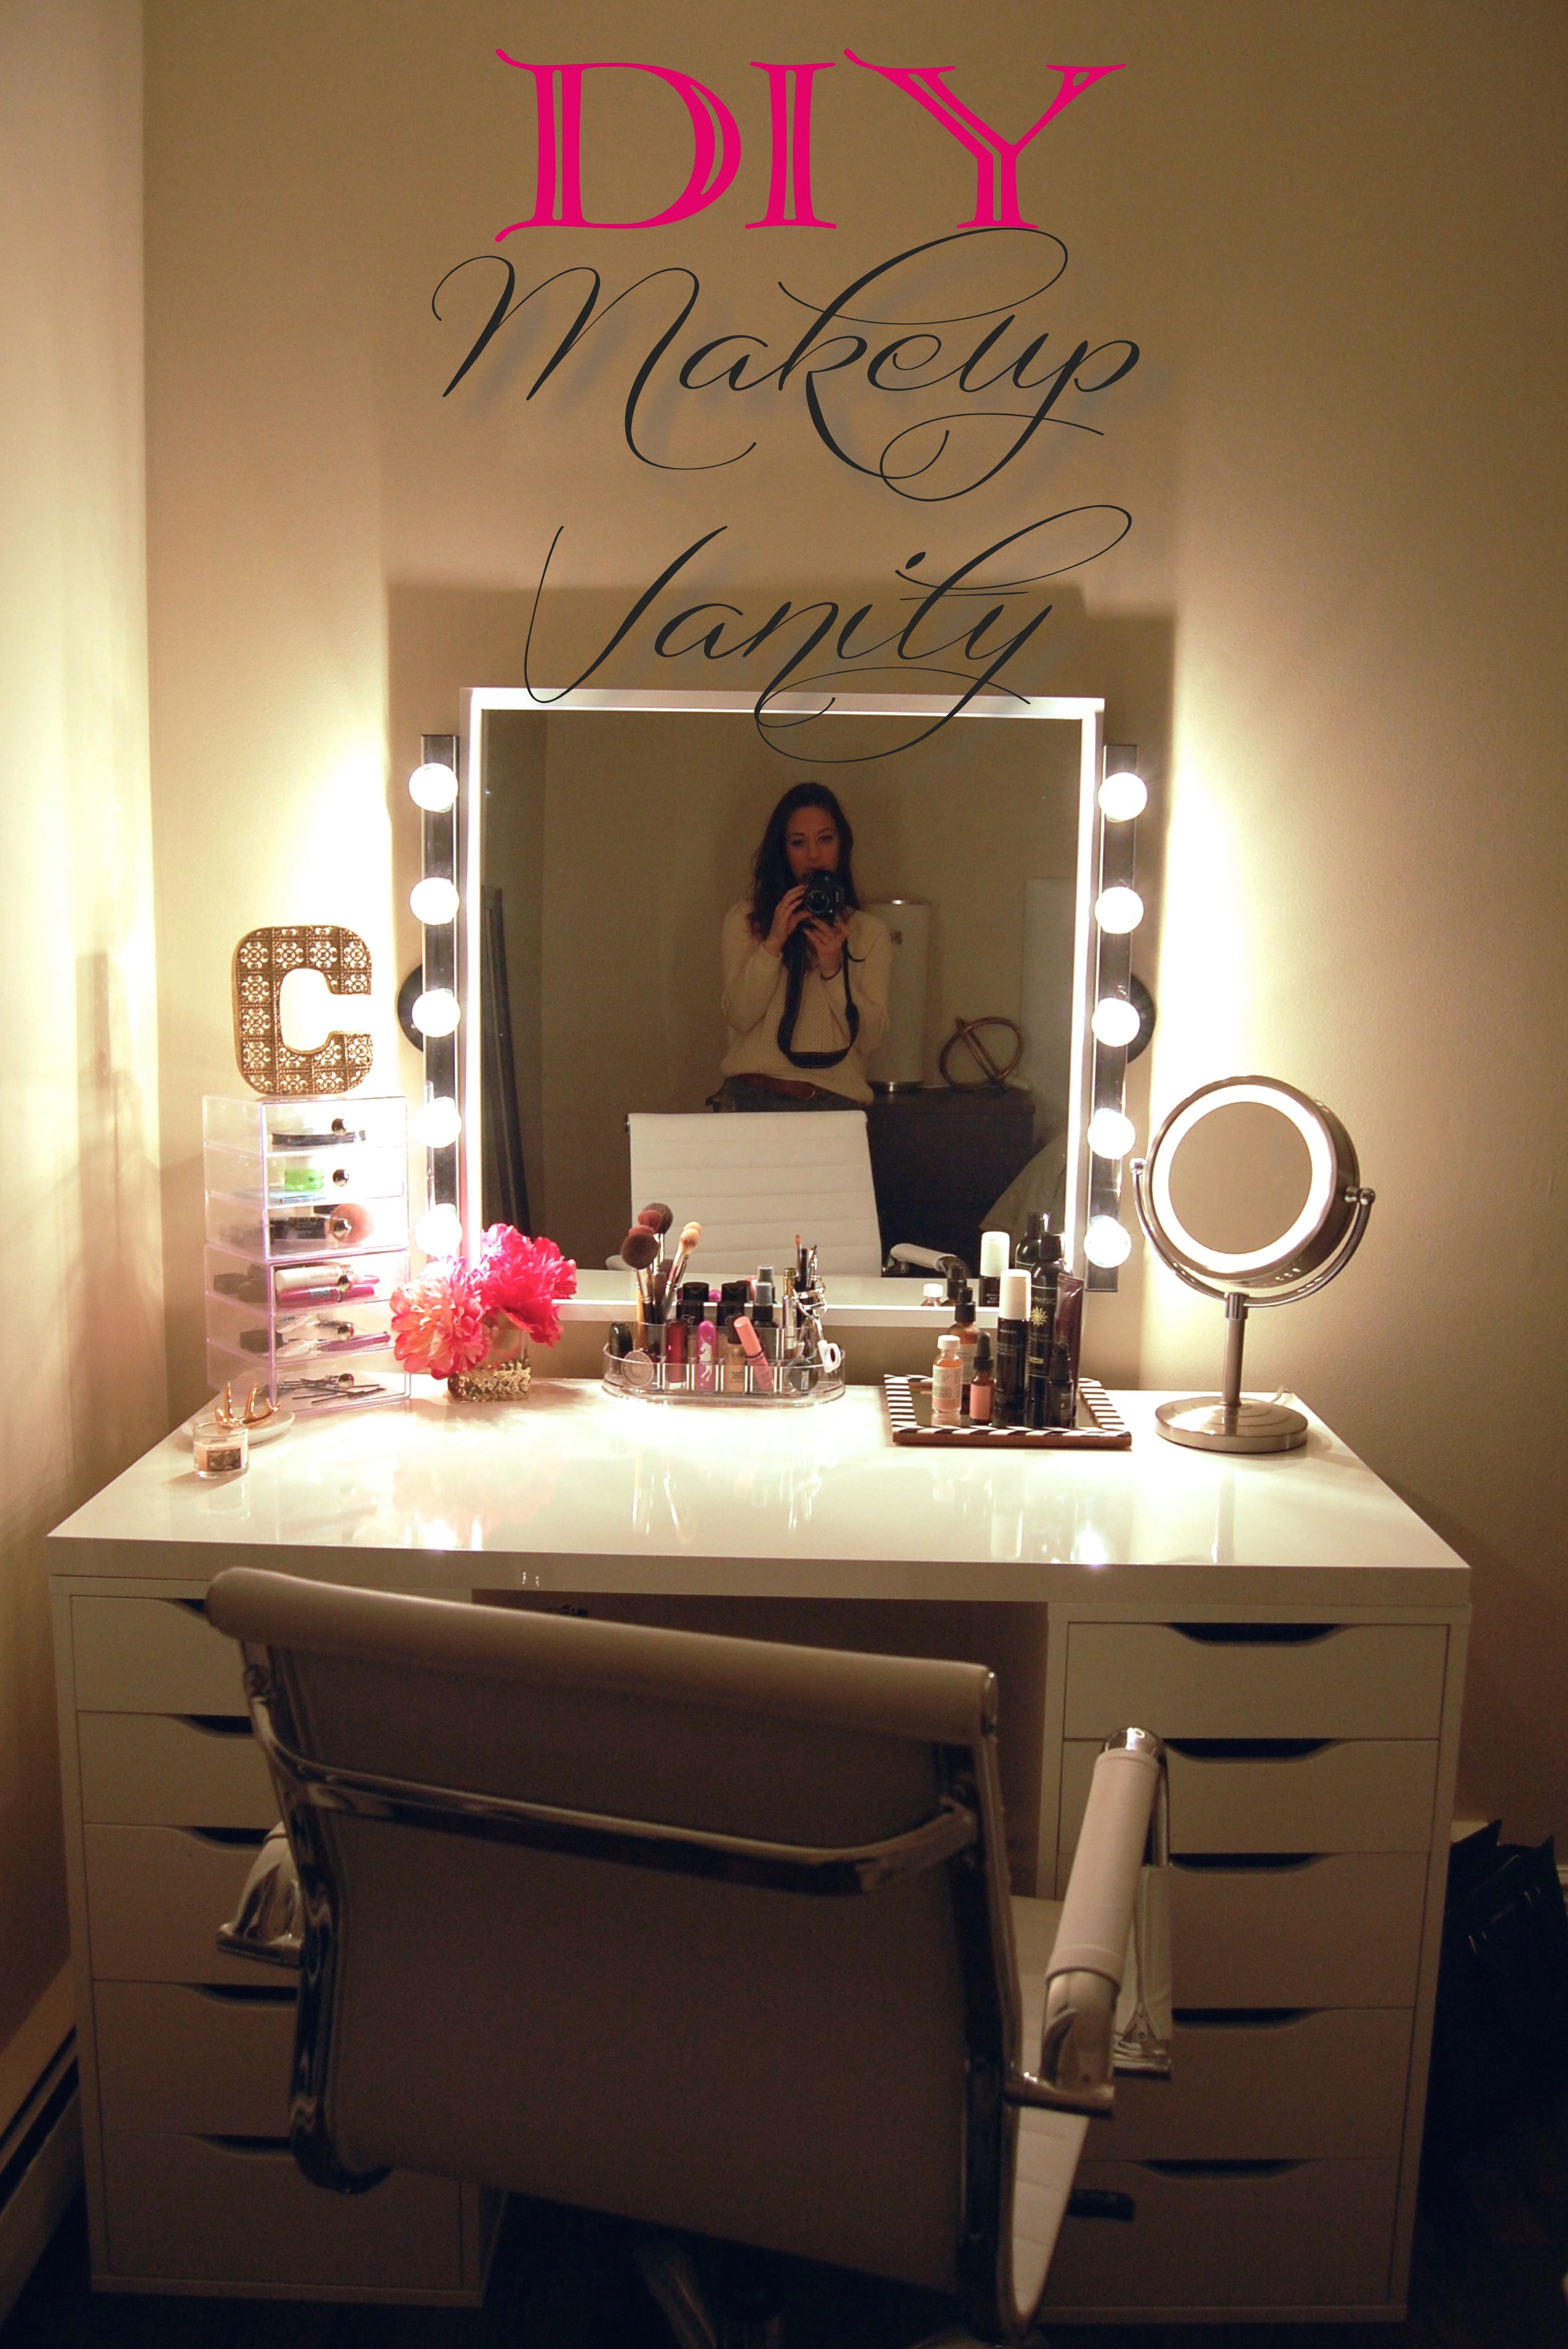 DIY Makeup Vanity - Made2Style on Makeup Room Ideas  id=25372